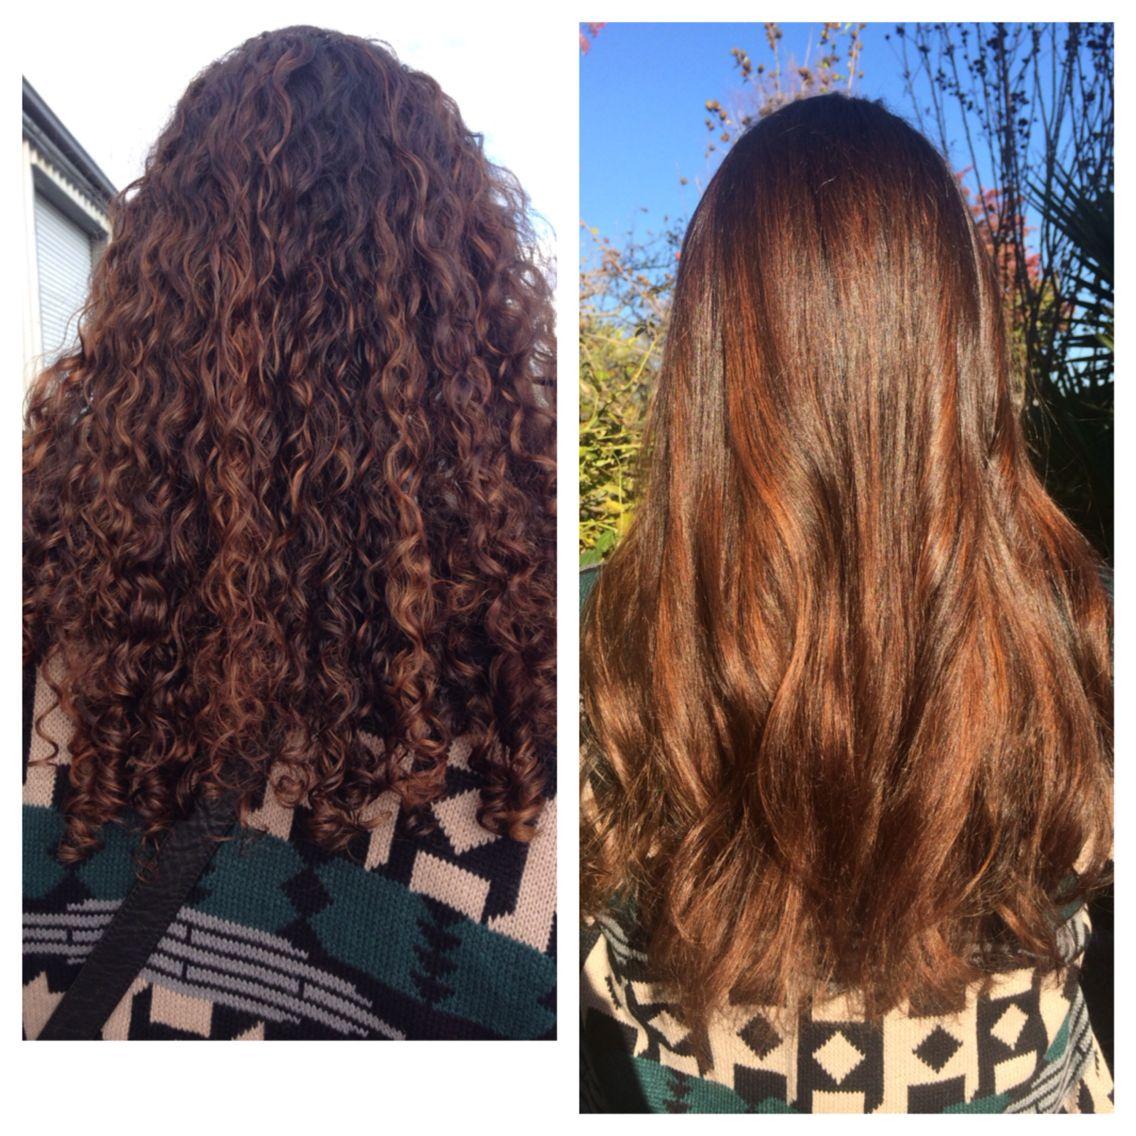 My Balayage Highlights Straight Vs Curly Hair Looks Amazing Both